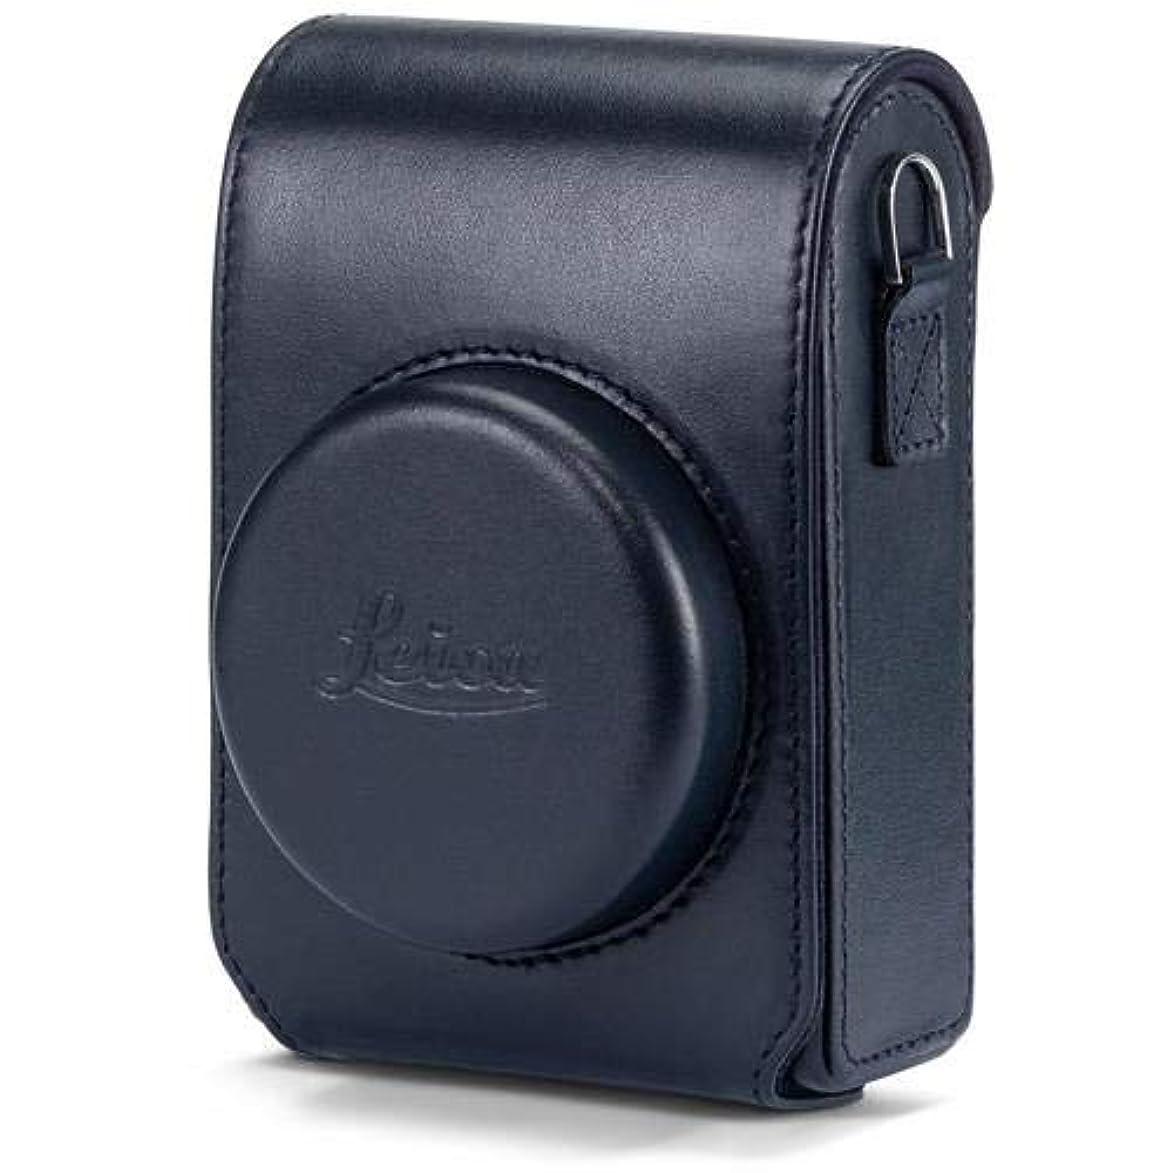 Leica C-LUX Leather Case (Blue)